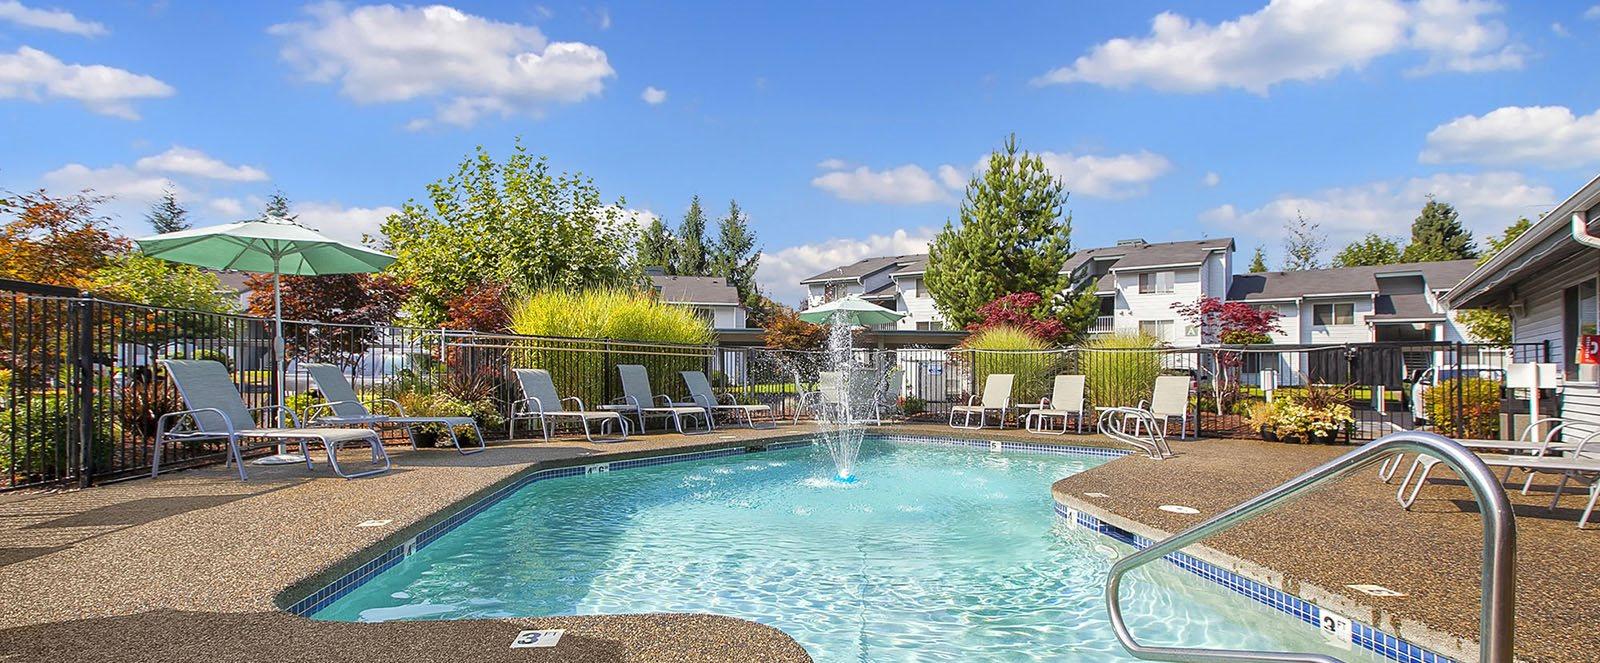 Meridian Garden Apartments - Kent, WA